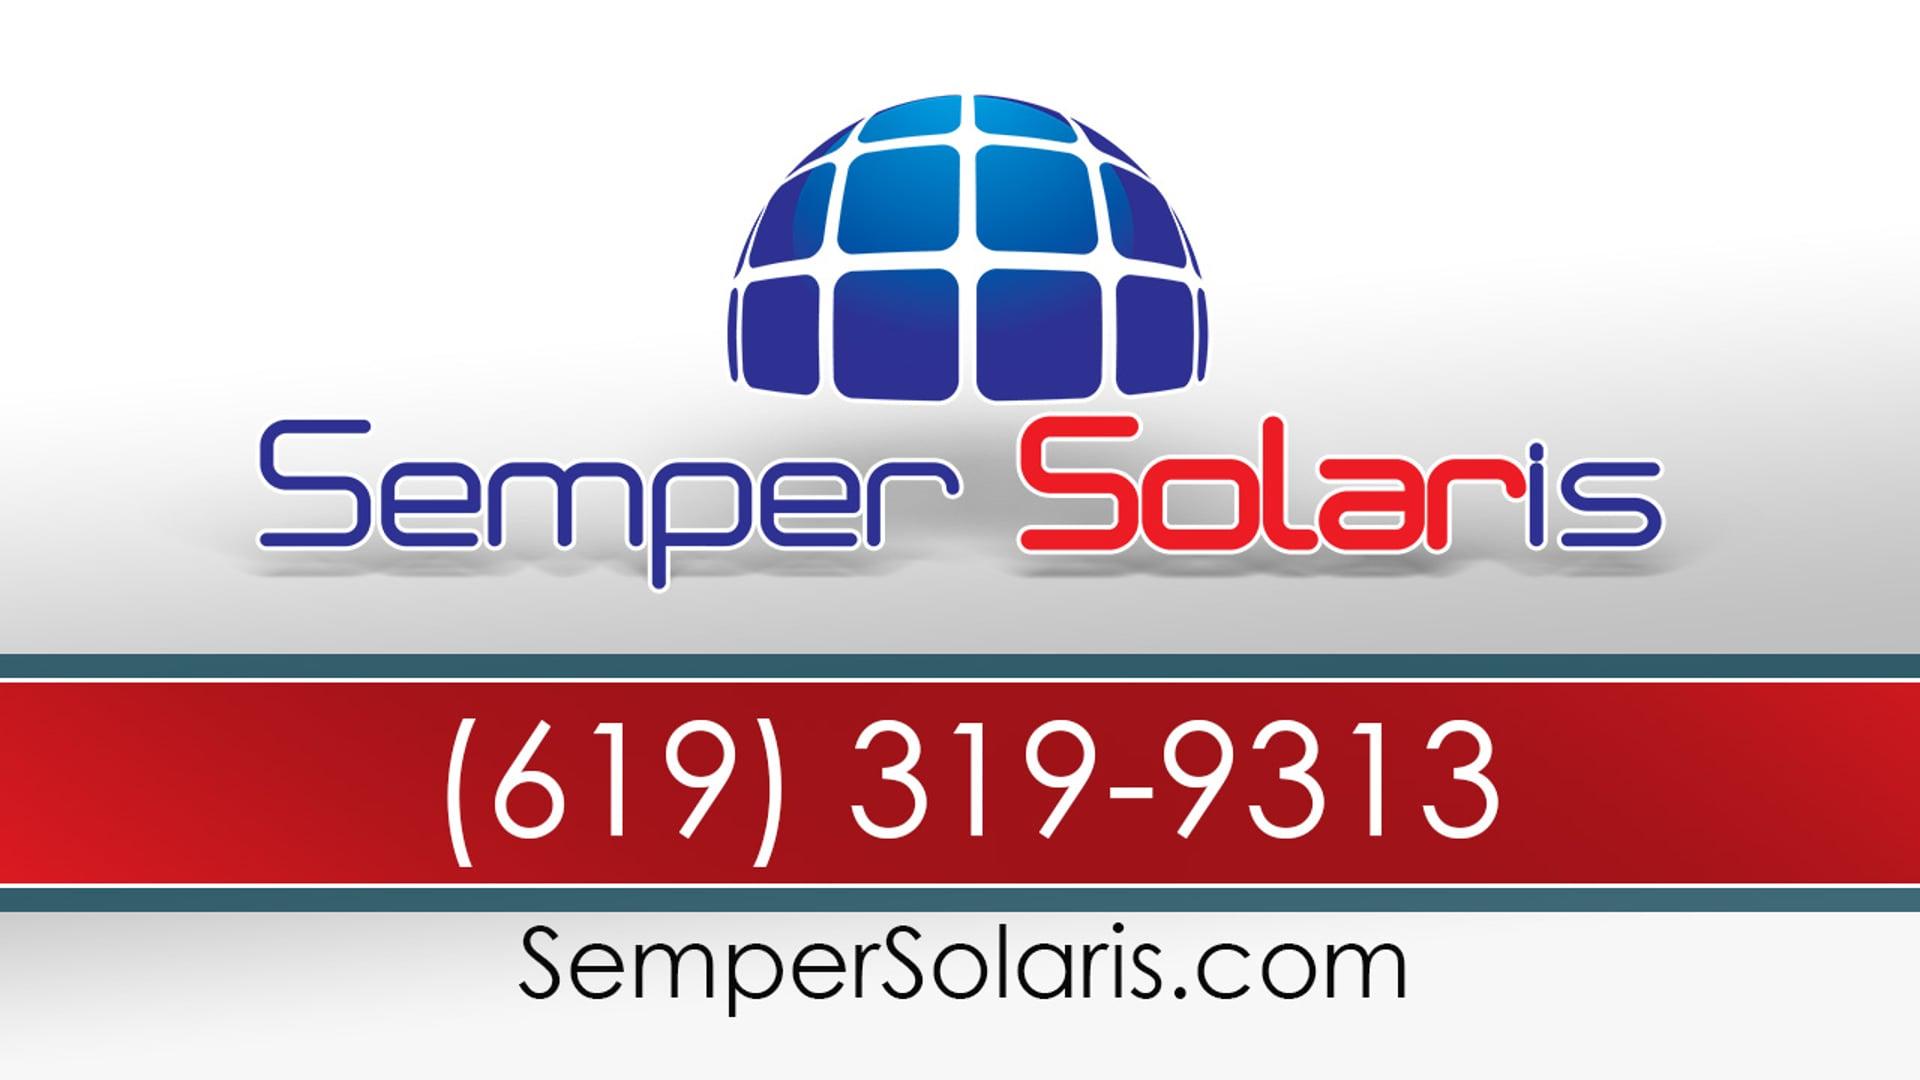 Best Solar Companies In Vista | SemperSolaris.com | Please Contact: (888) 210-3366